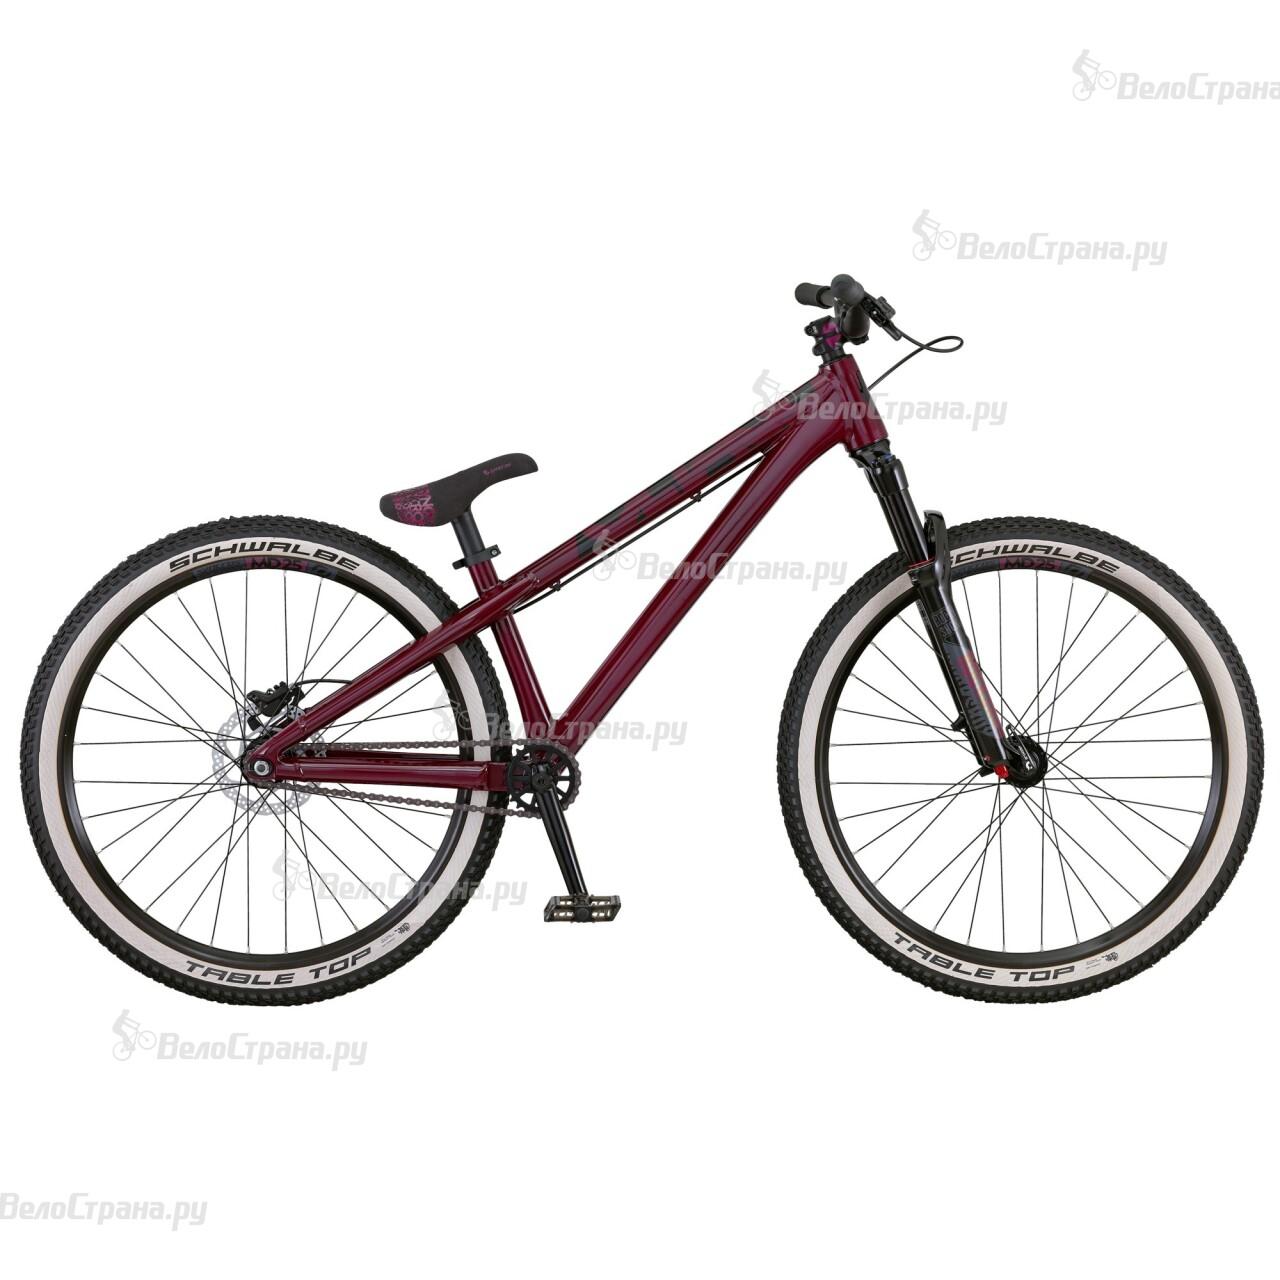 Велосипед Scott Voltage YZ 0.1 (2016)  цены